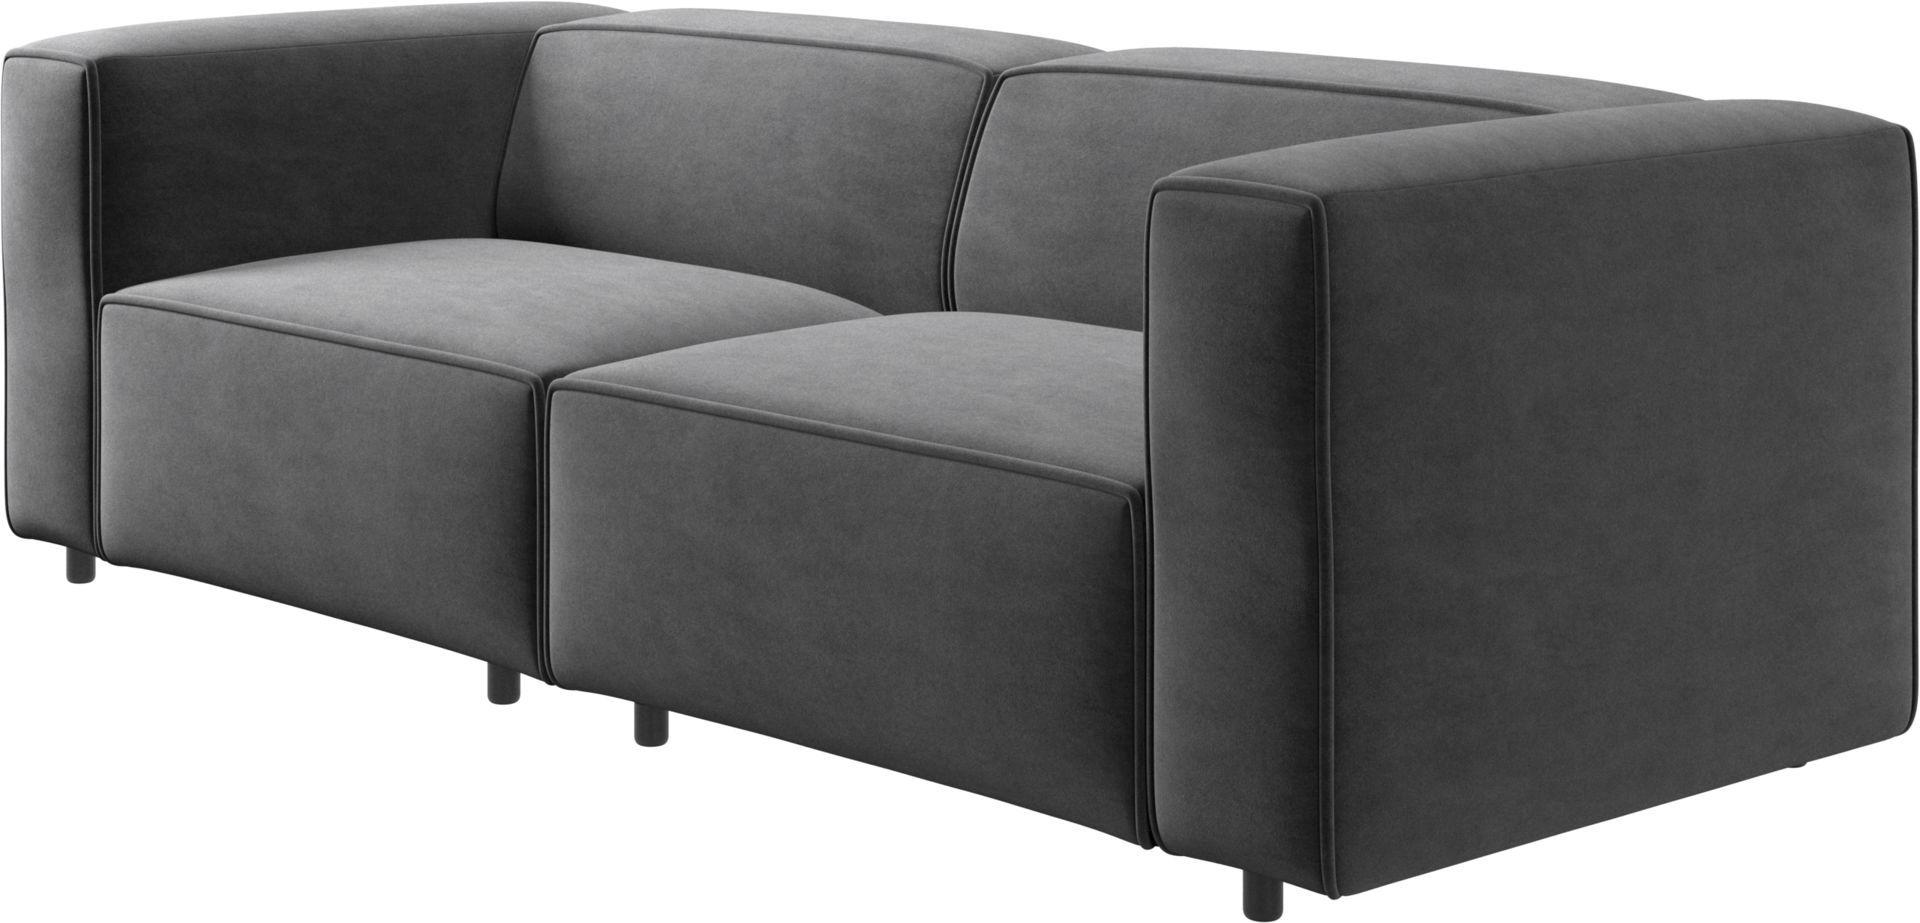 Carmo Sofa Sofa Boconcept 2 Sitzer Sofa